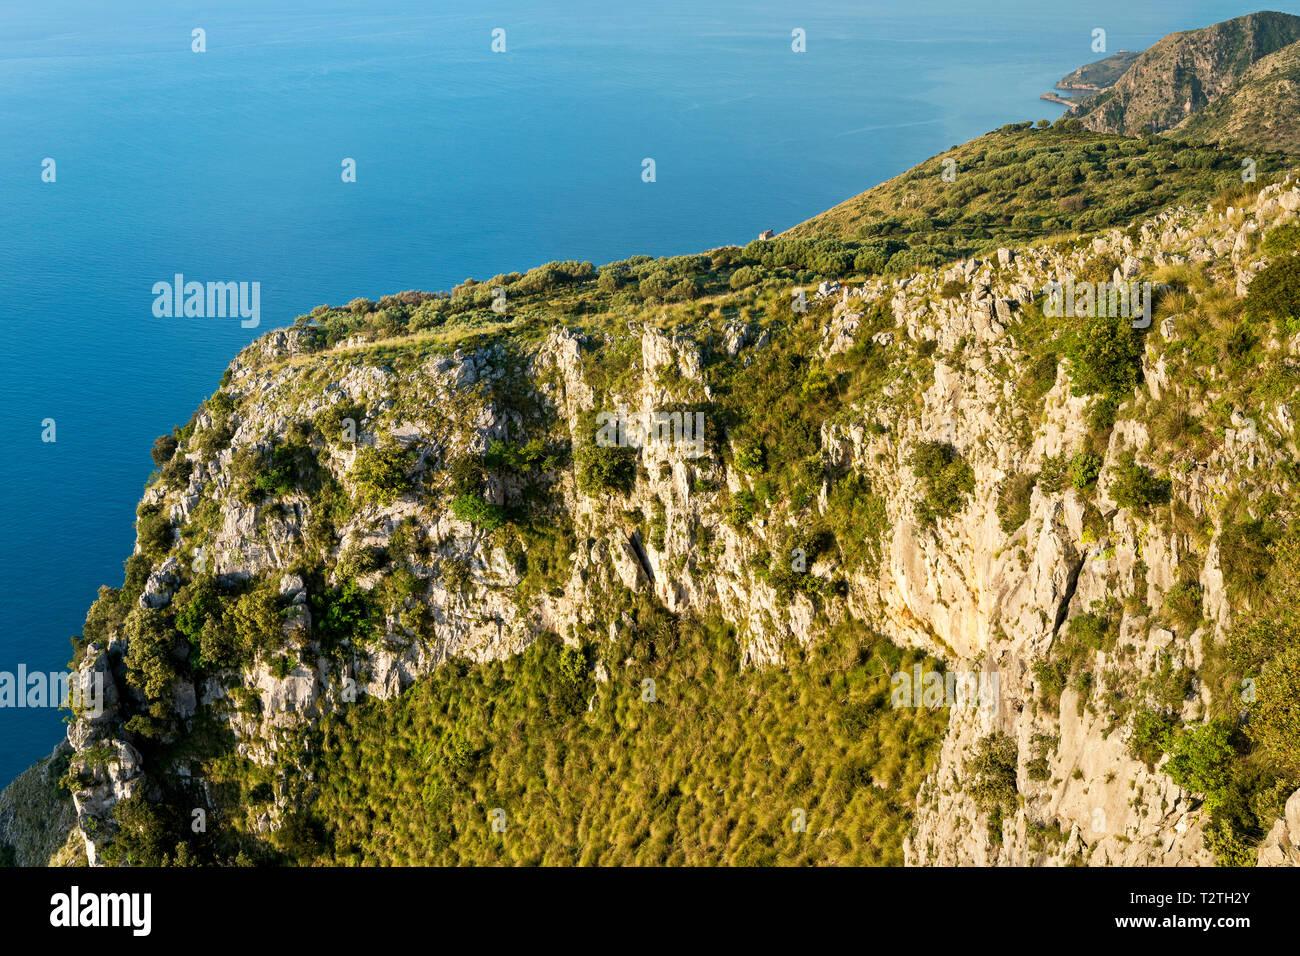 Italy, Campania, Cilento National Park,  Masseta and Infreschi Marine protected area - Stock Image